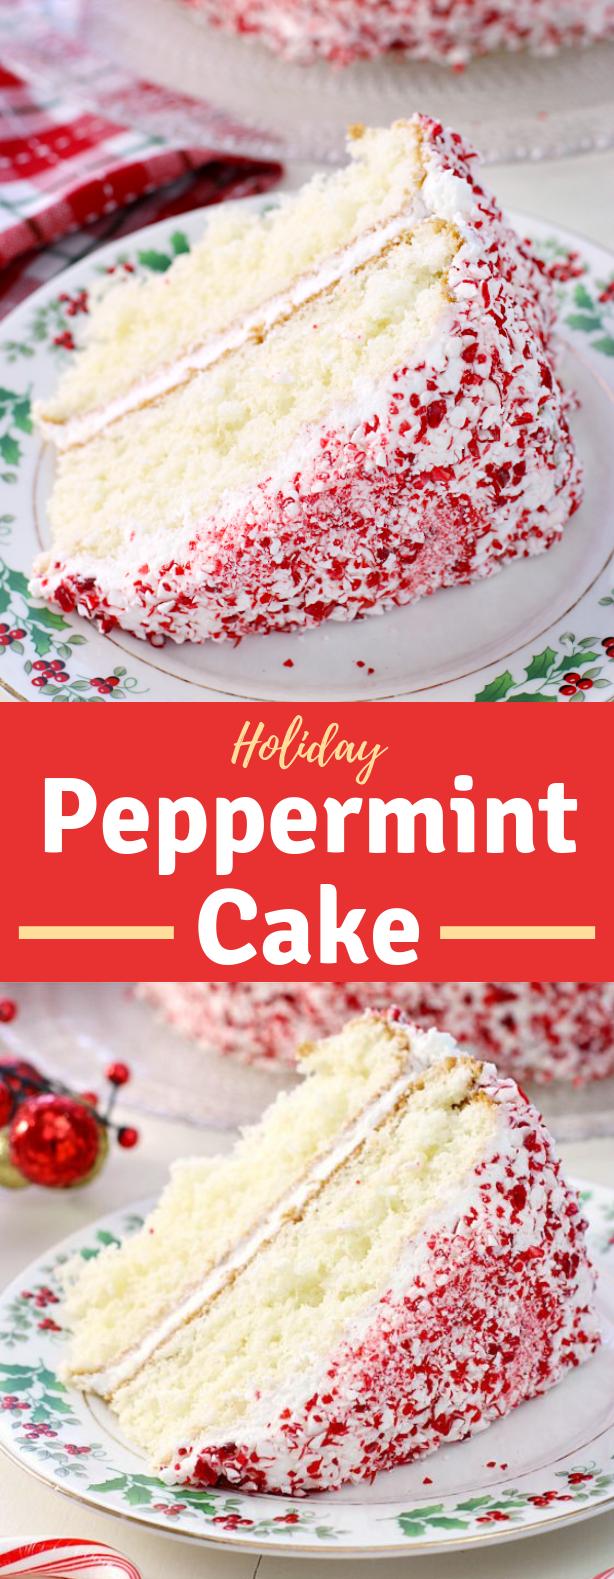 HOLIDAY PEPPERMINT CAKE #HolidayCake #Dessert